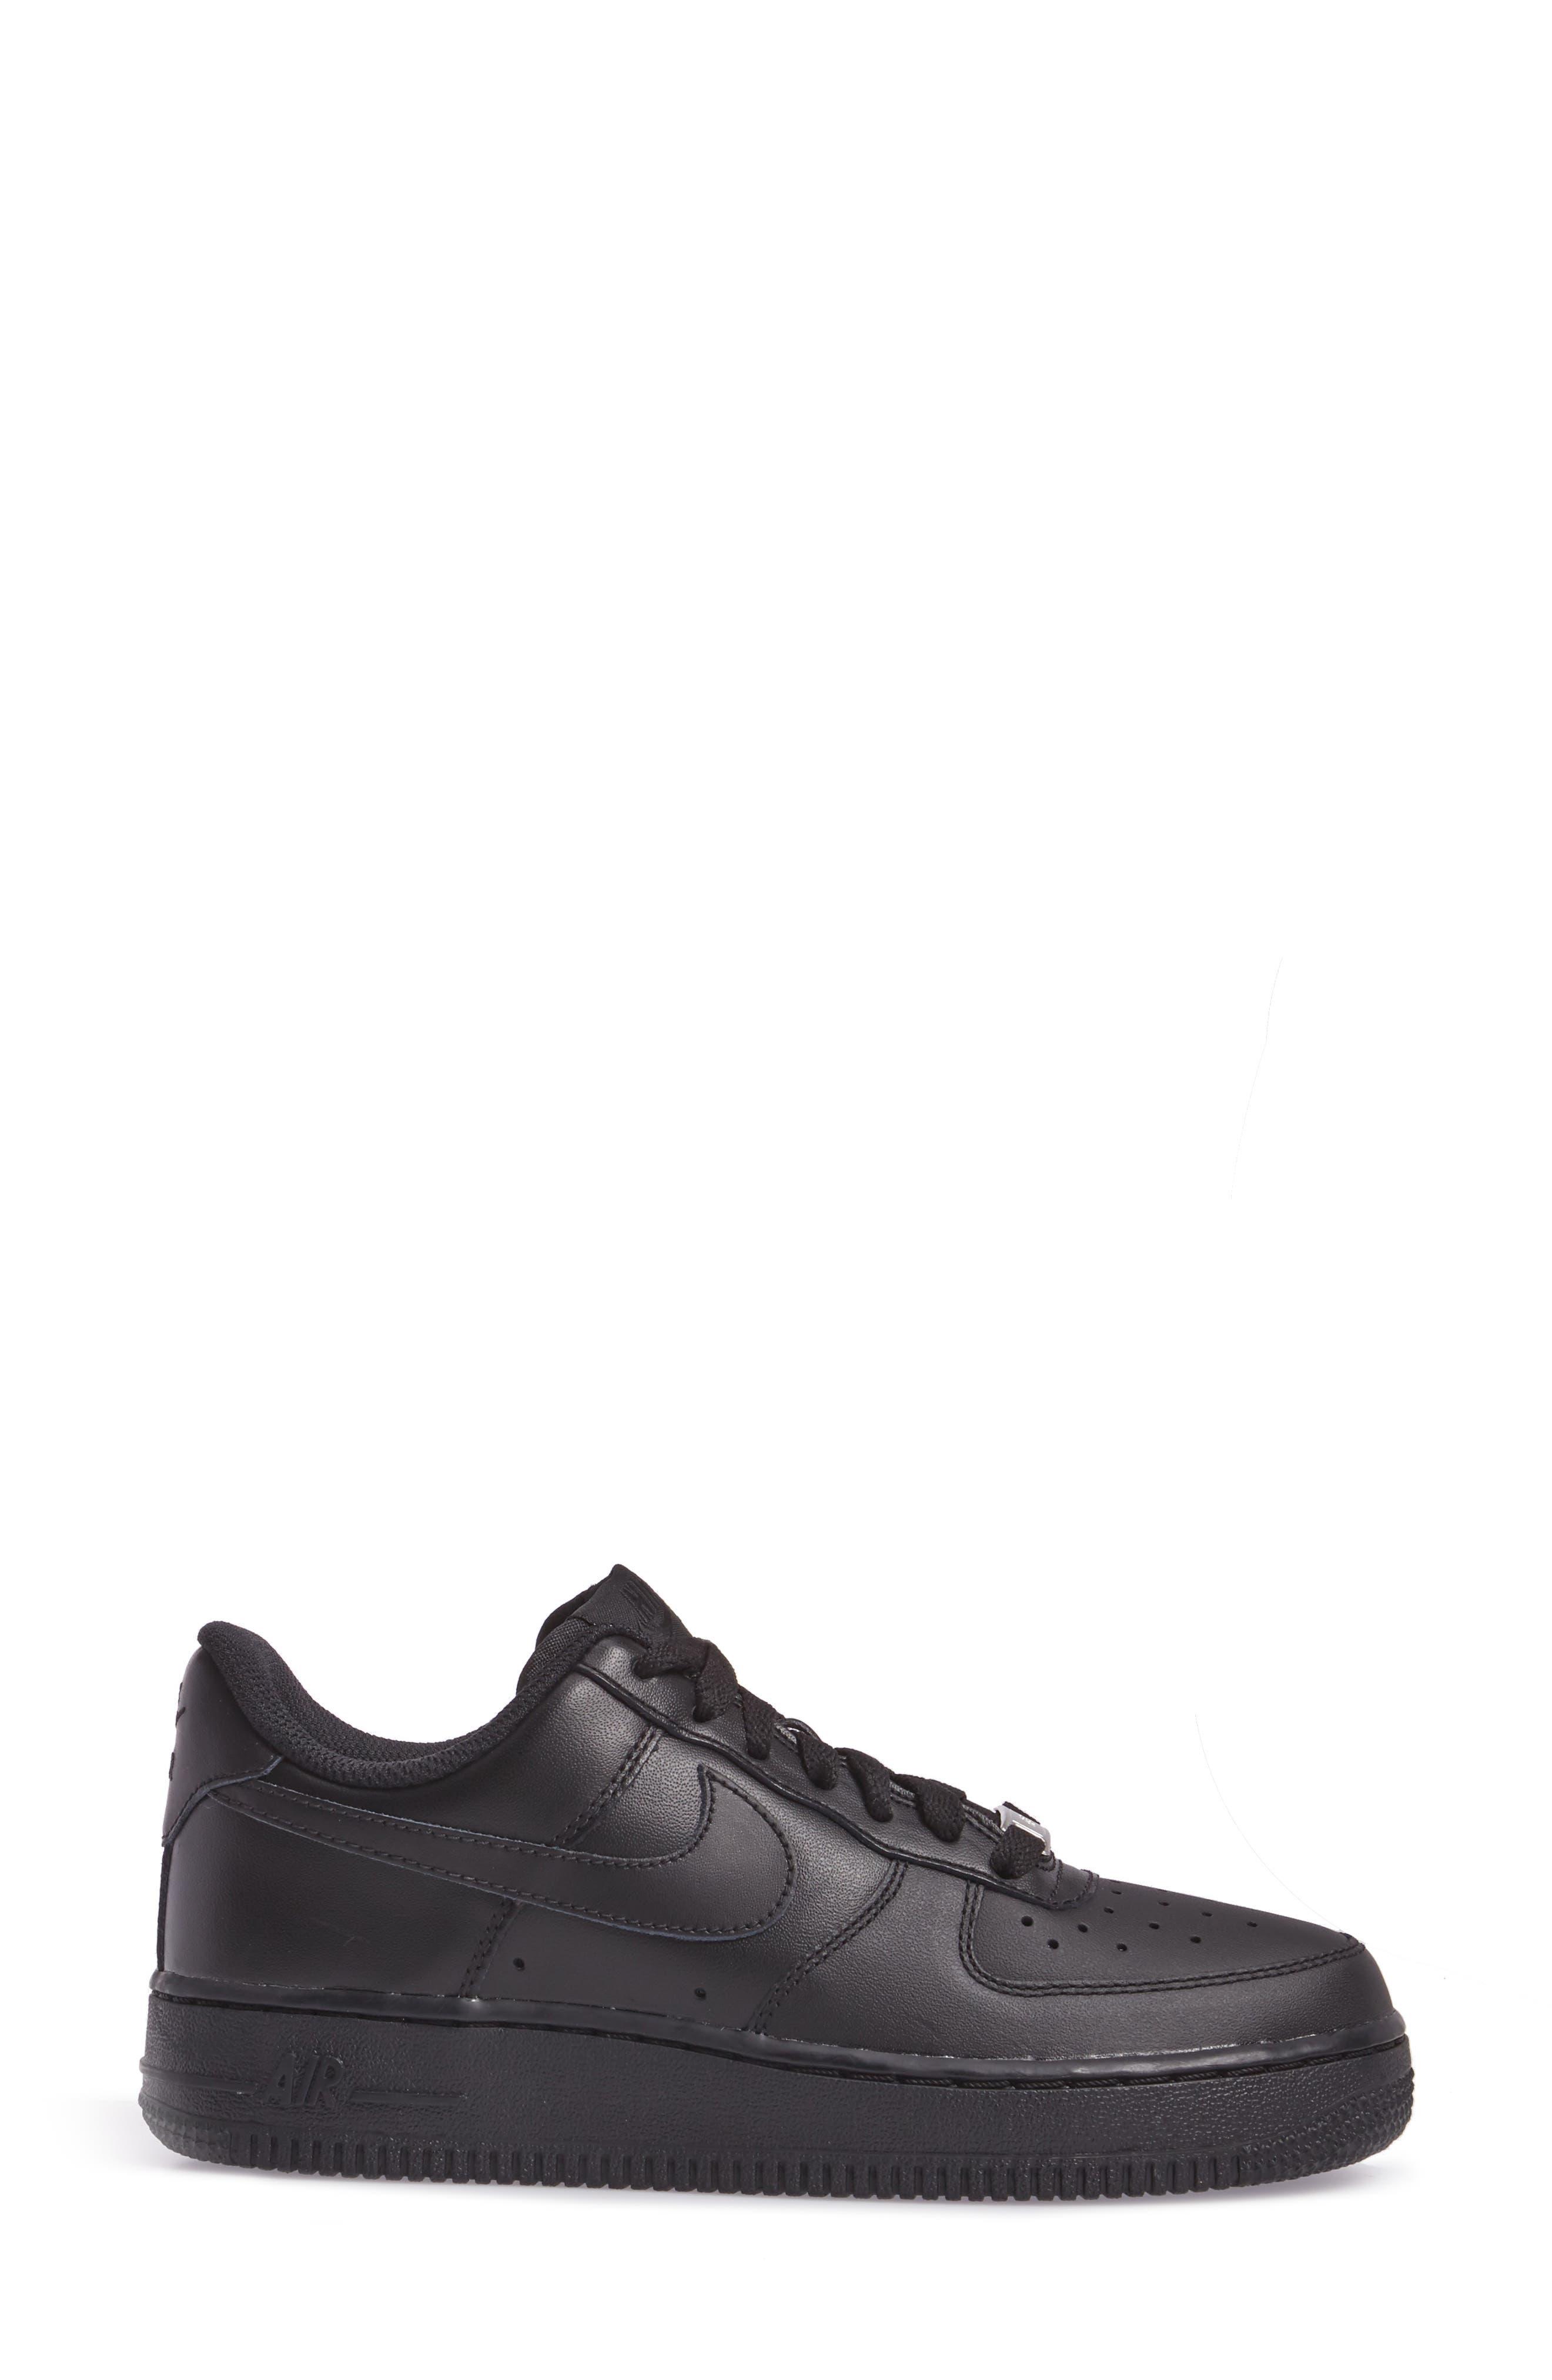 'Air Force 1' Basketball Sneaker,                             Alternate thumbnail 3, color,                             BLACK/ BLACK